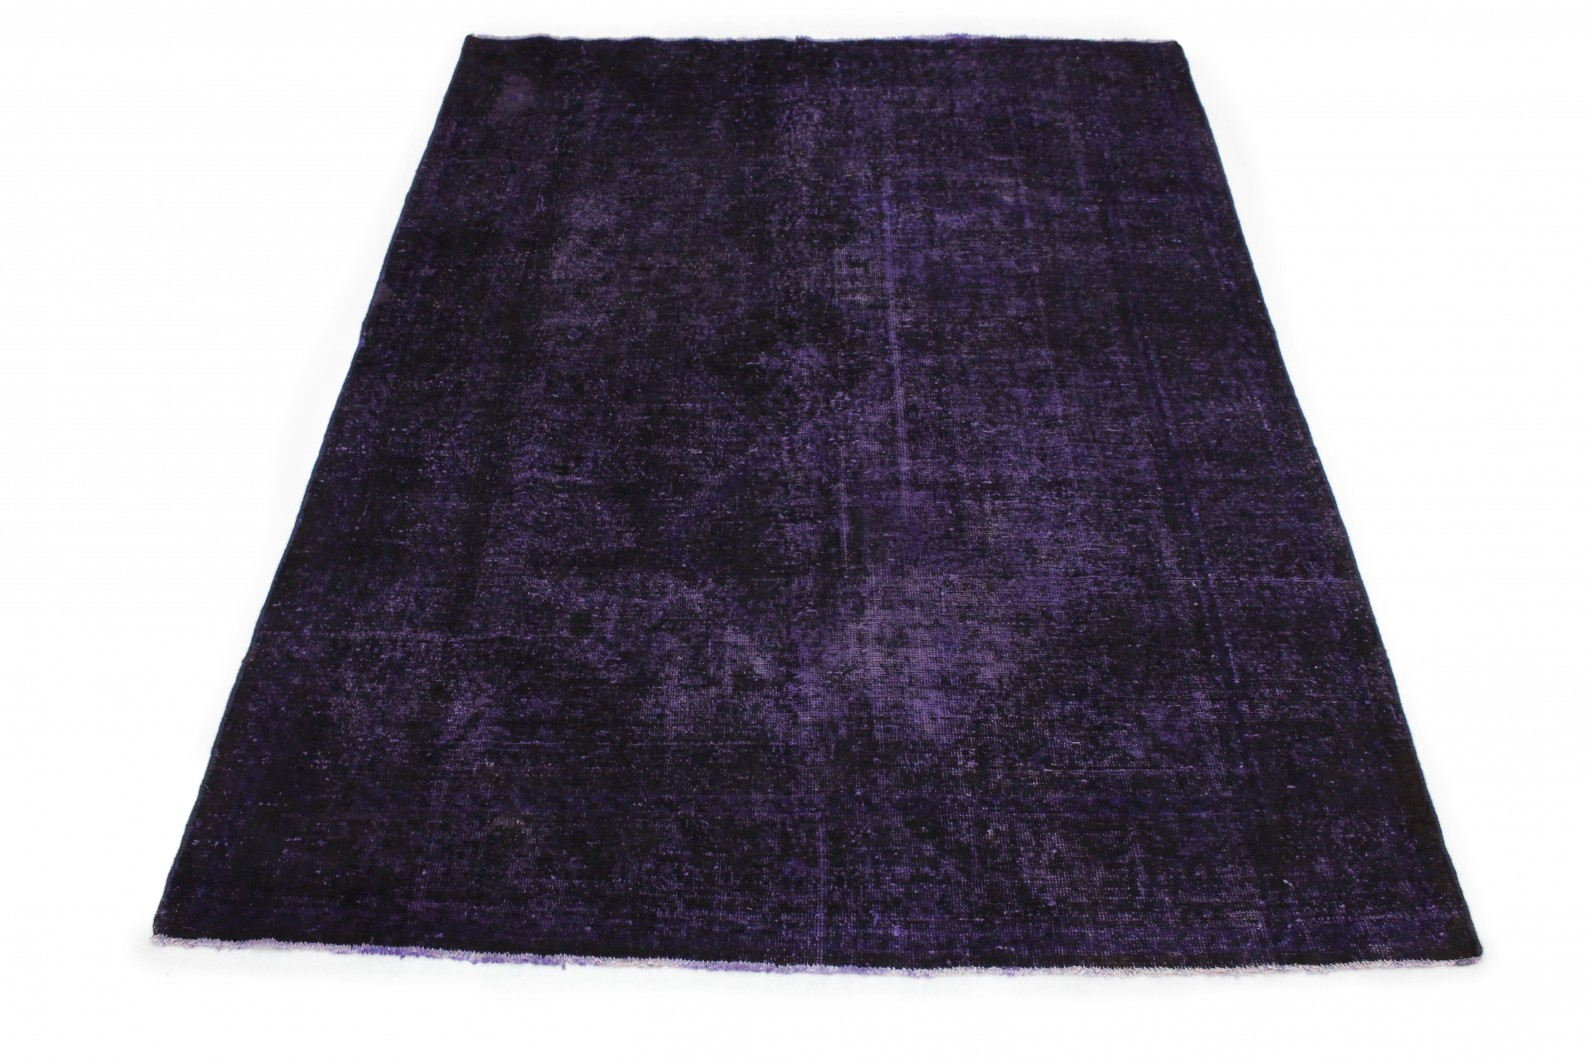 Vintage Teppich Lila Schwarz in 290x210cm